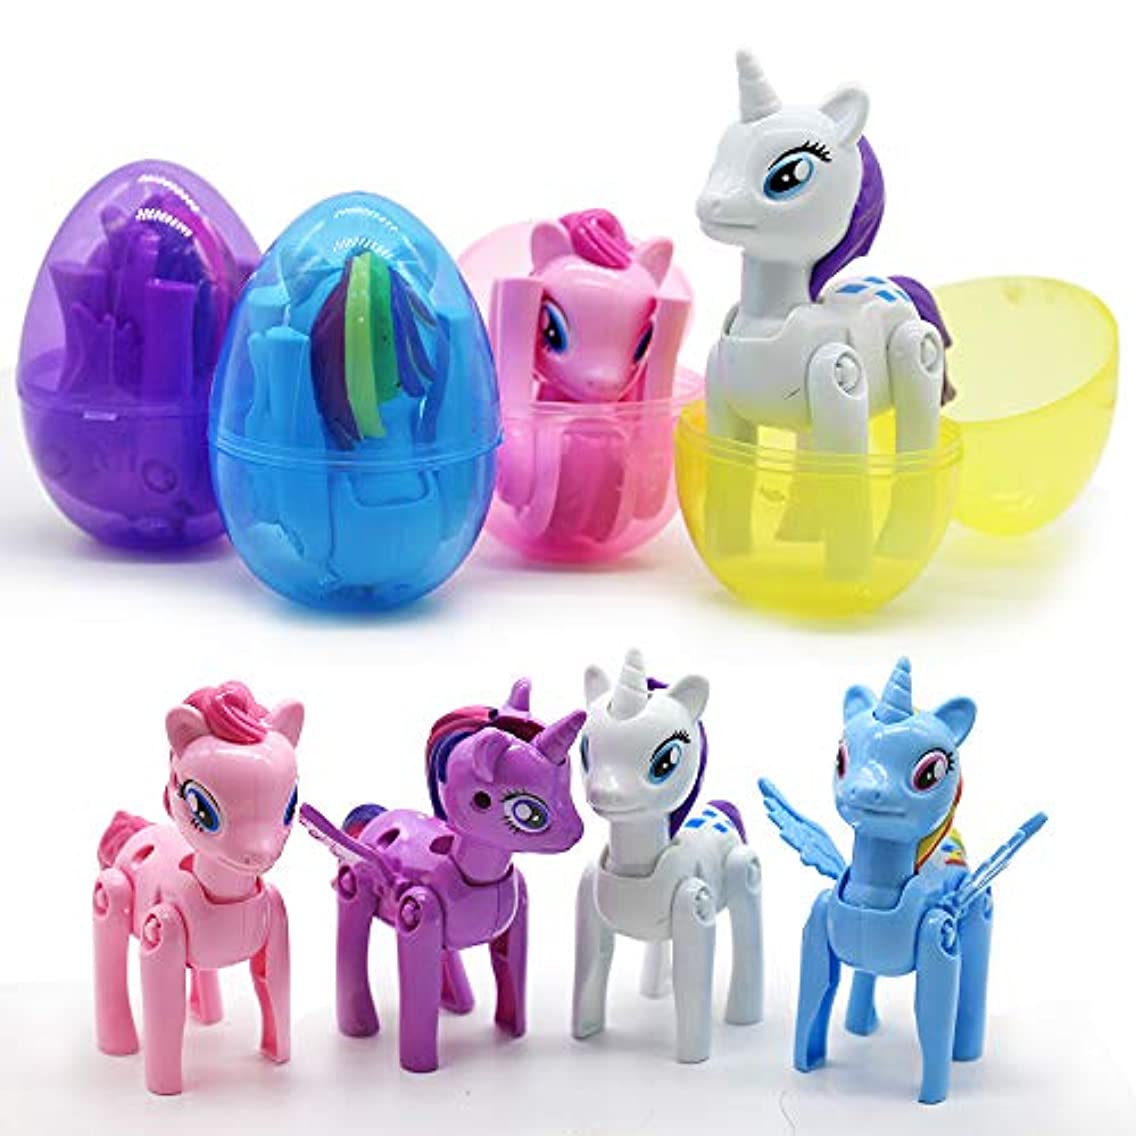 ENlink 4 Pack Jumbo Unicorn Deformation Easter Eggs Easter Basket Stuffers Filled Toys Inside for Kids Boys Girls Unicorn Party Supplies Party Favors